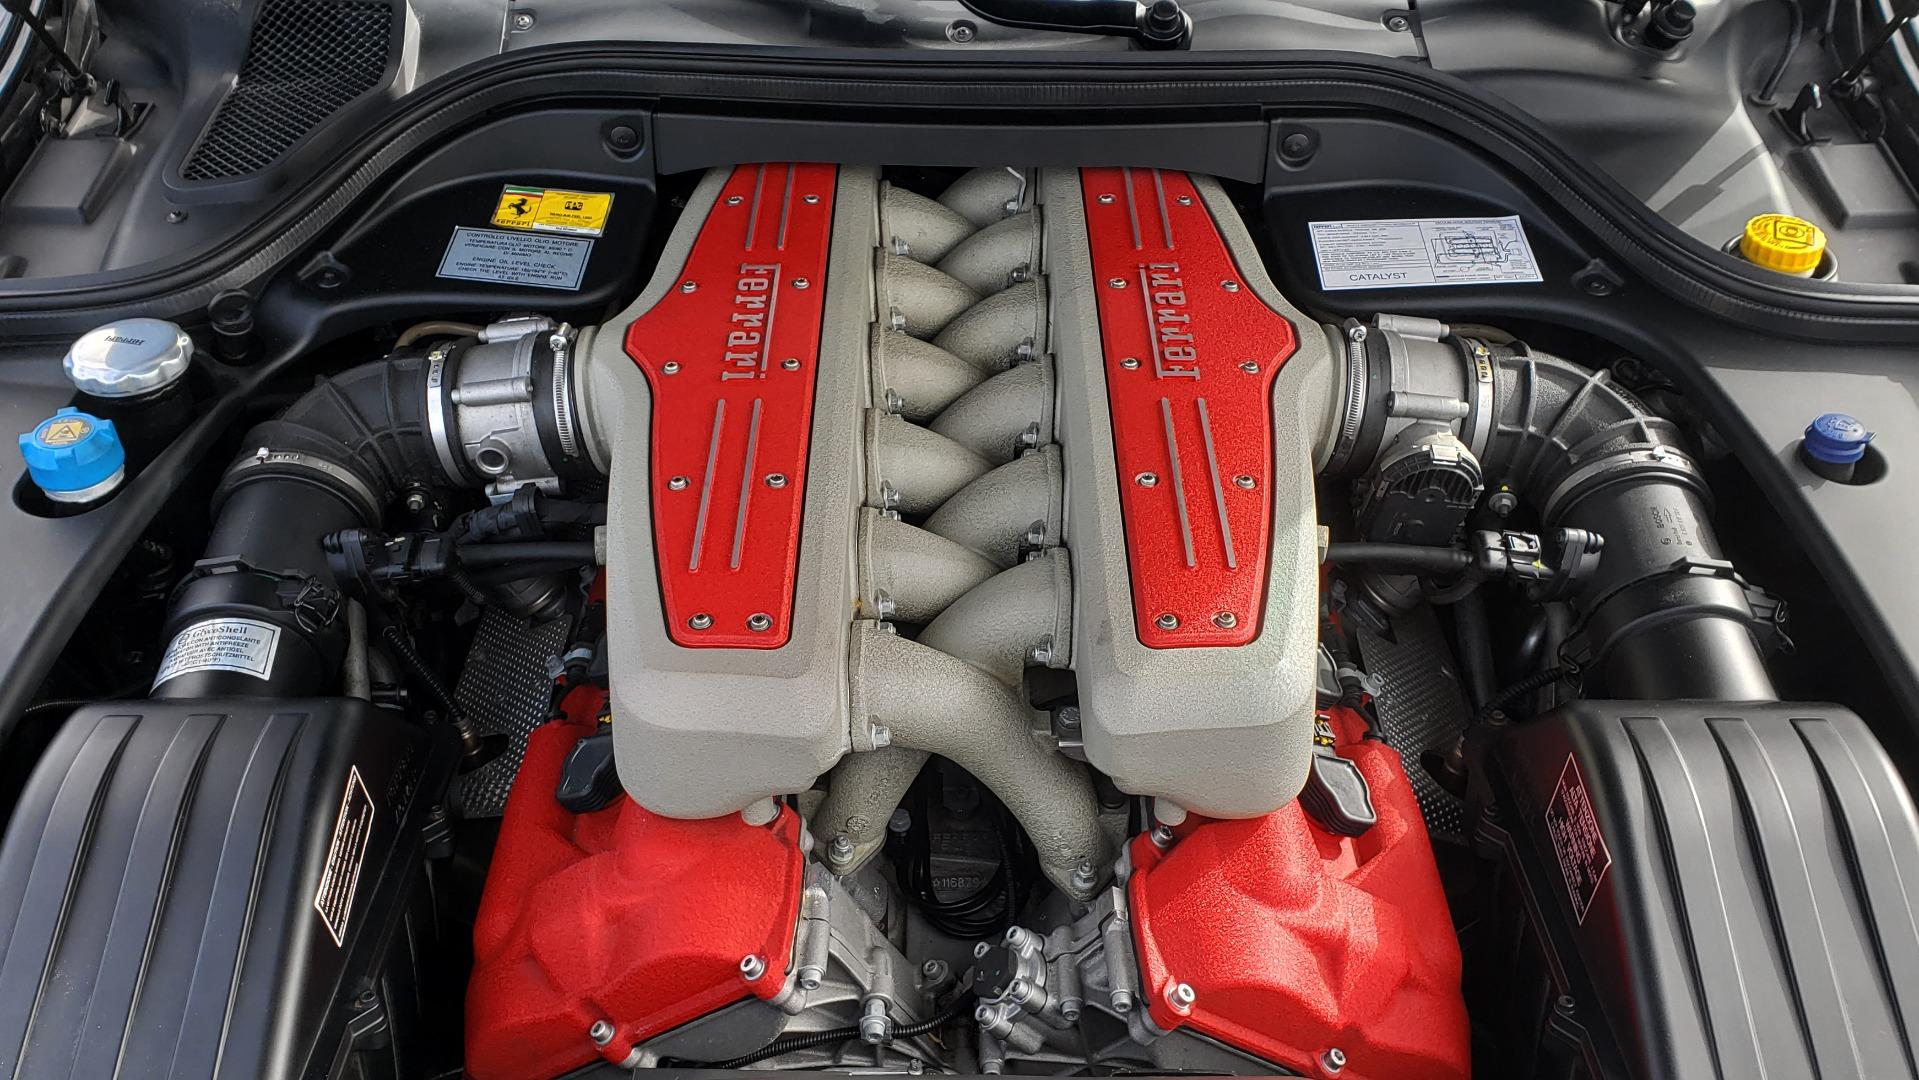 Used 2007 Ferrari 599 GTB FIORANO HGTE / V12 / F1 TRANS / NAV / BOSE / CUSTOM WHEELS for sale $109,999 at Formula Imports in Charlotte NC 28227 59